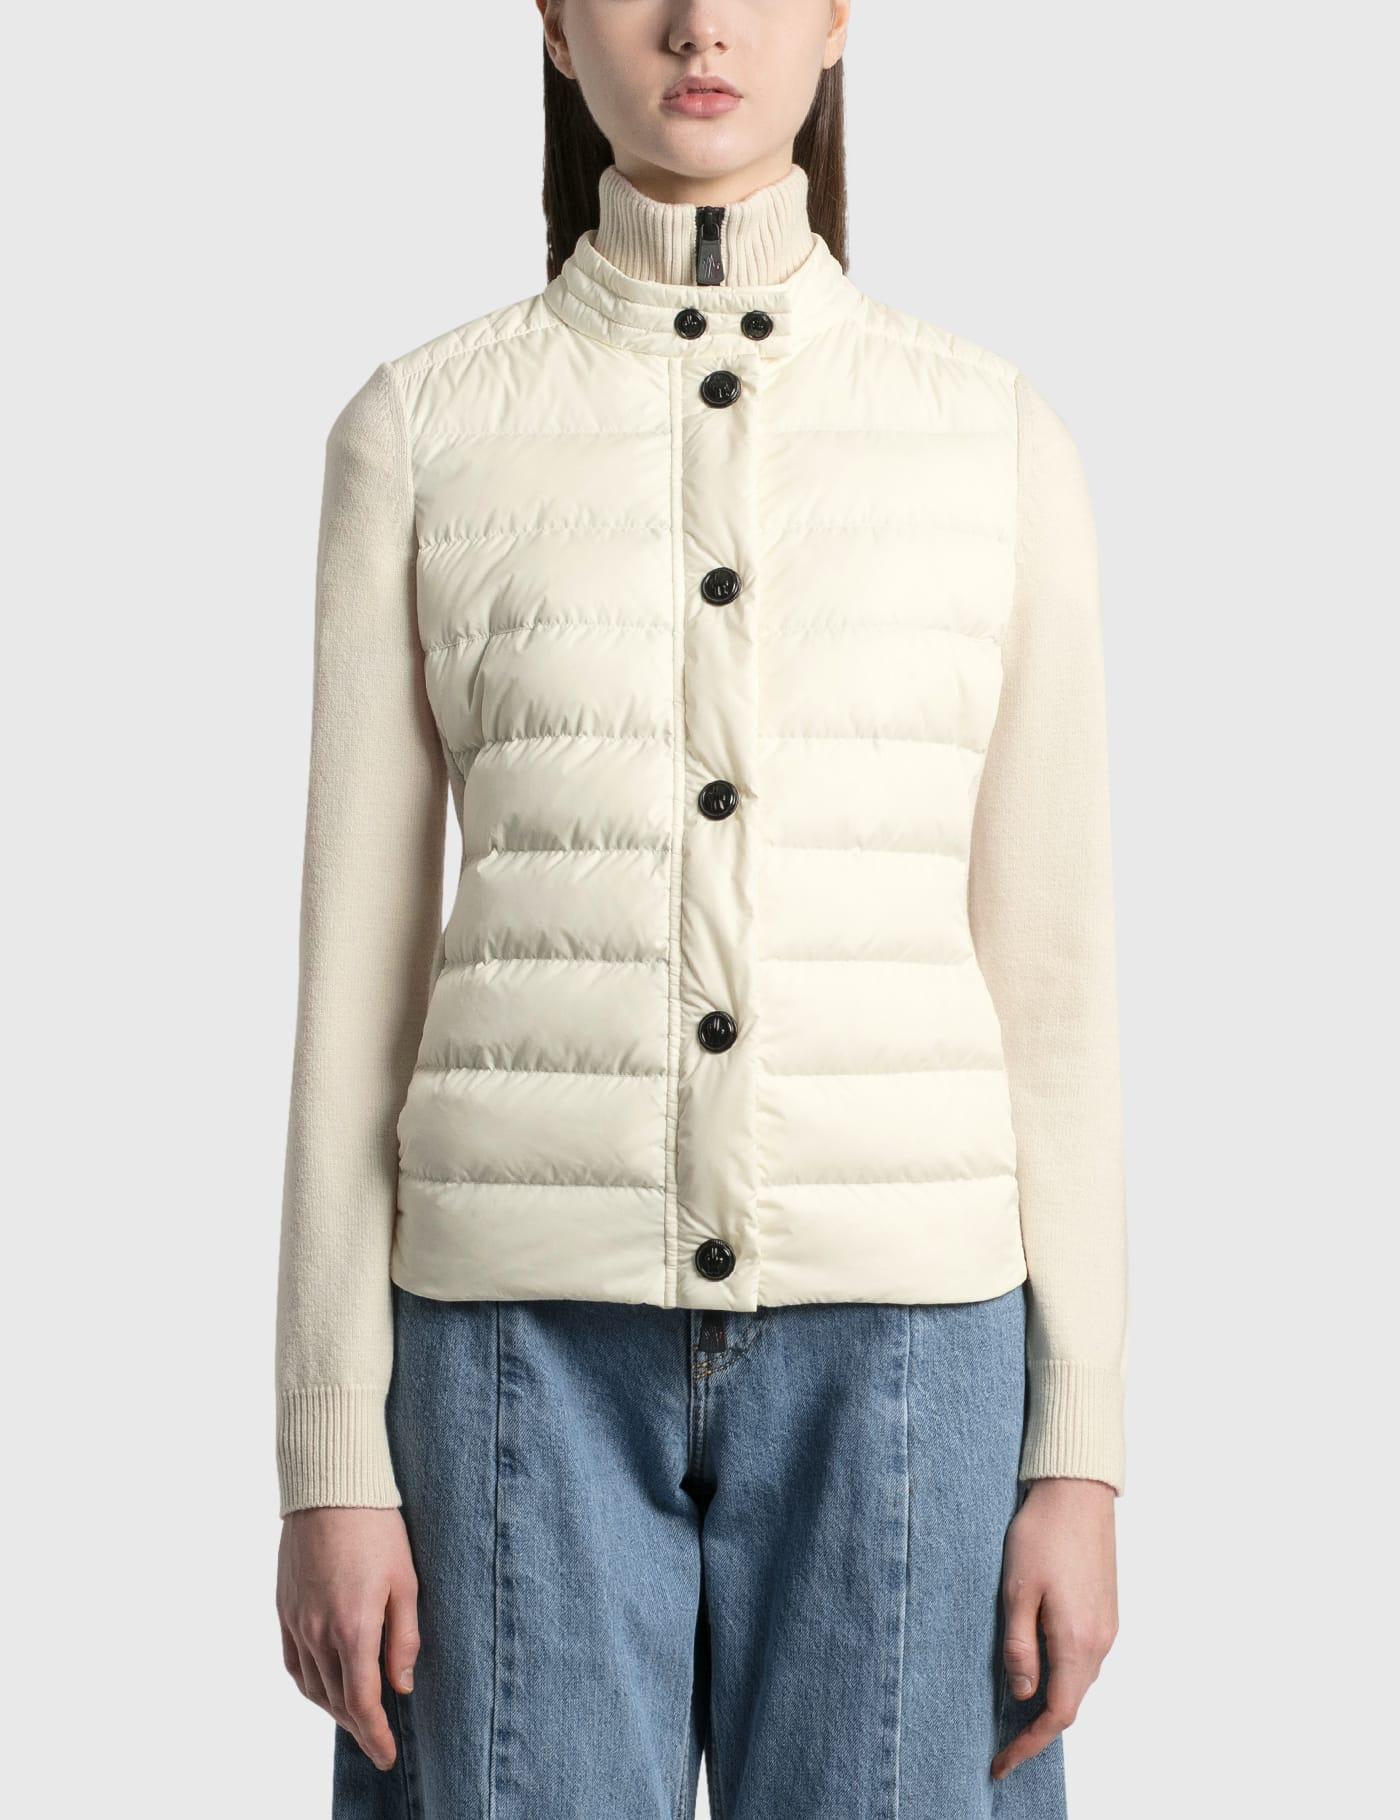 Padded Knit Zipped Jacket